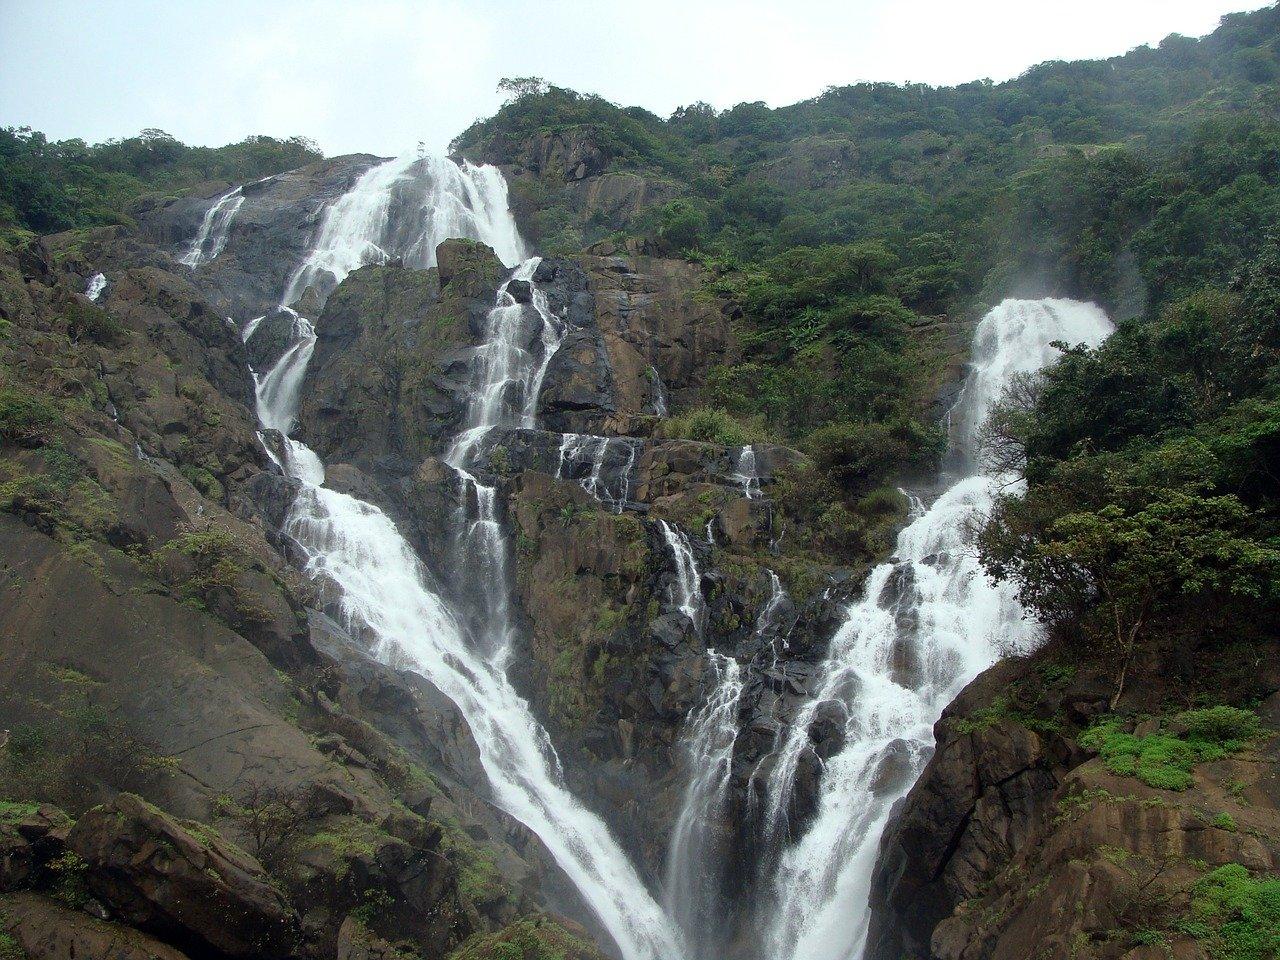 The Natural Beauty Of The Dudhsagar Falls, Goa